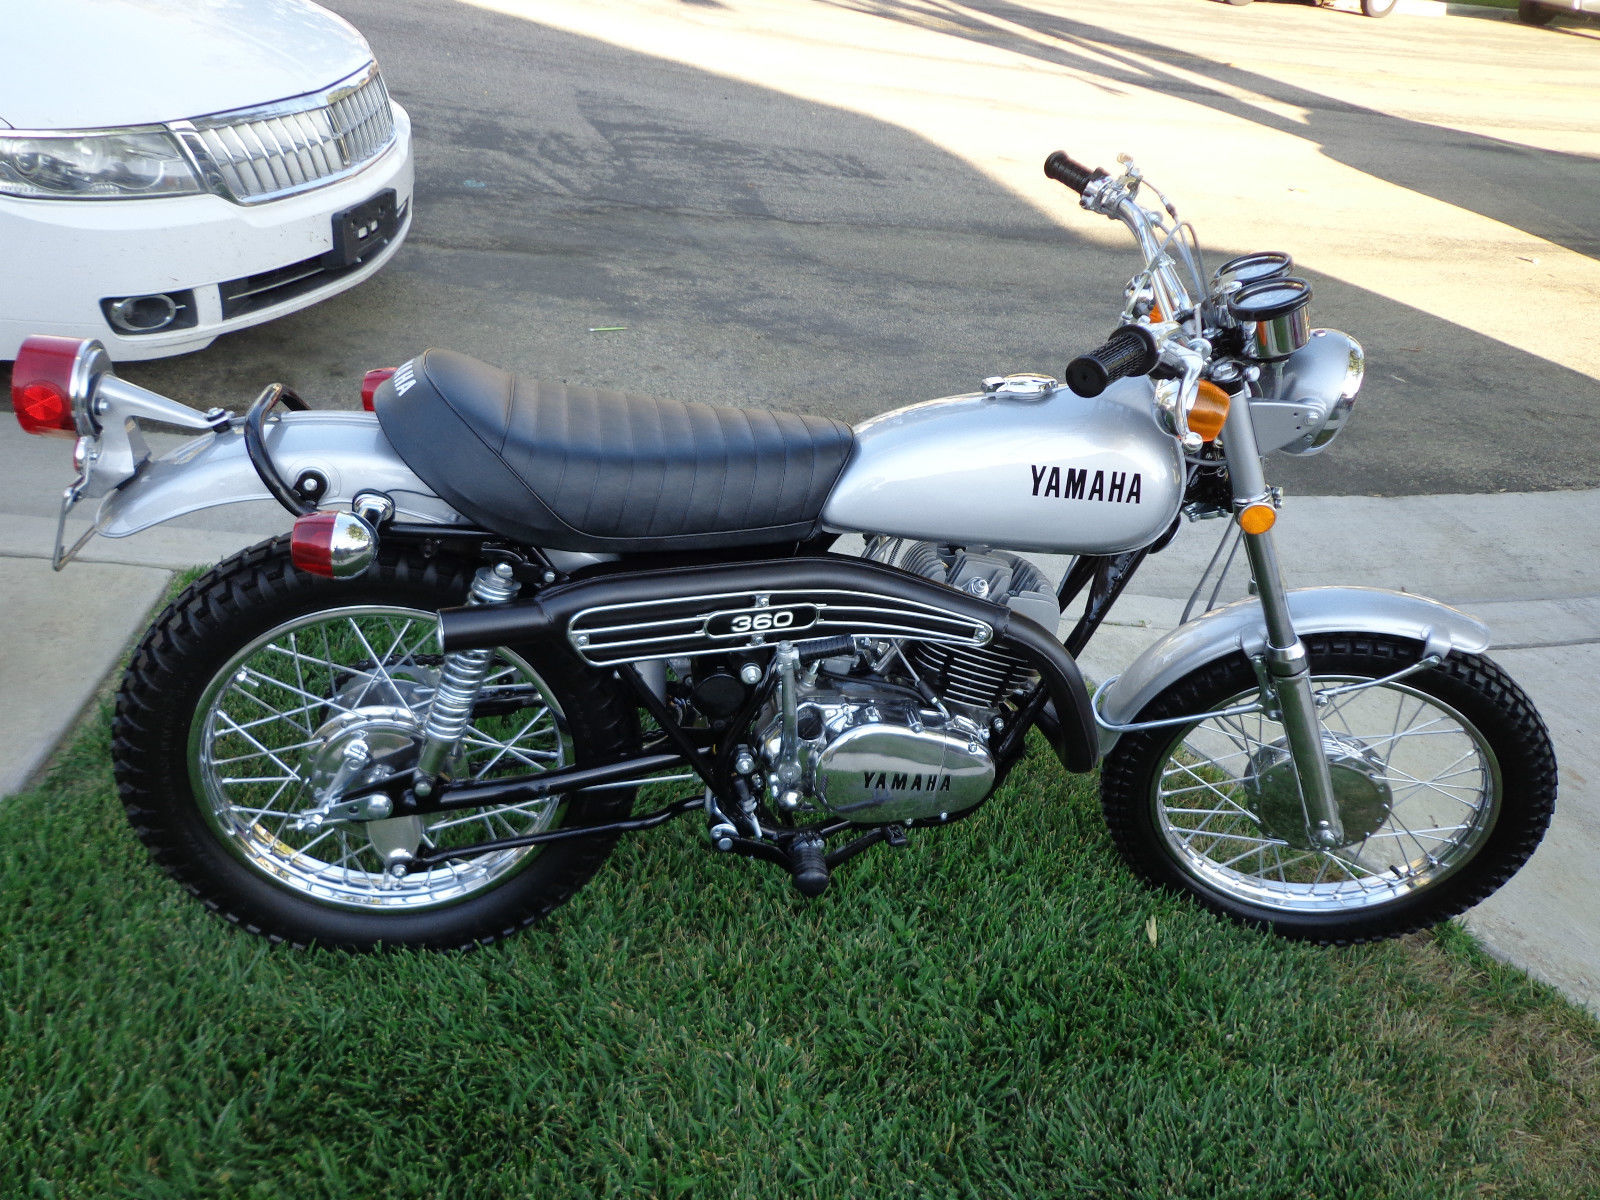 Restored yamaha rt2 360 enduro 1972 photographs at for Yamaha motorcycle parts online